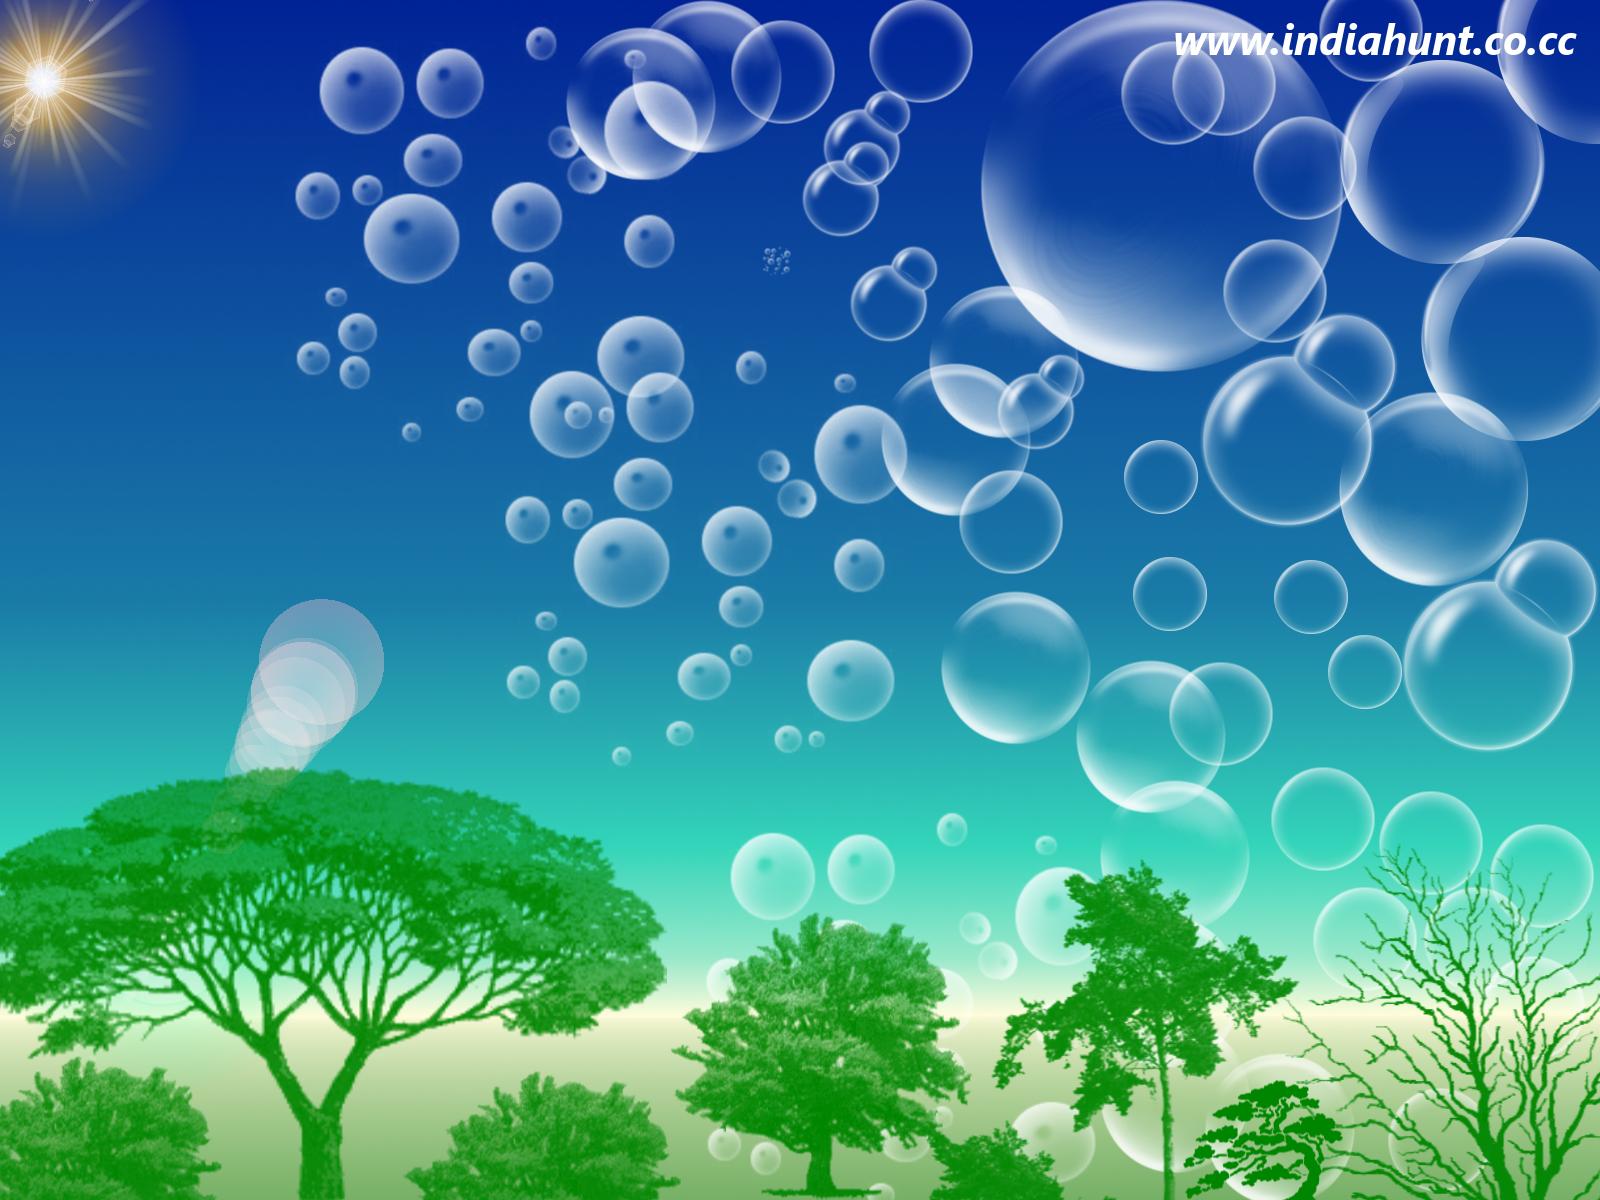 animated aquarium wallpaper windows 7 894 hd desktop wallpaper